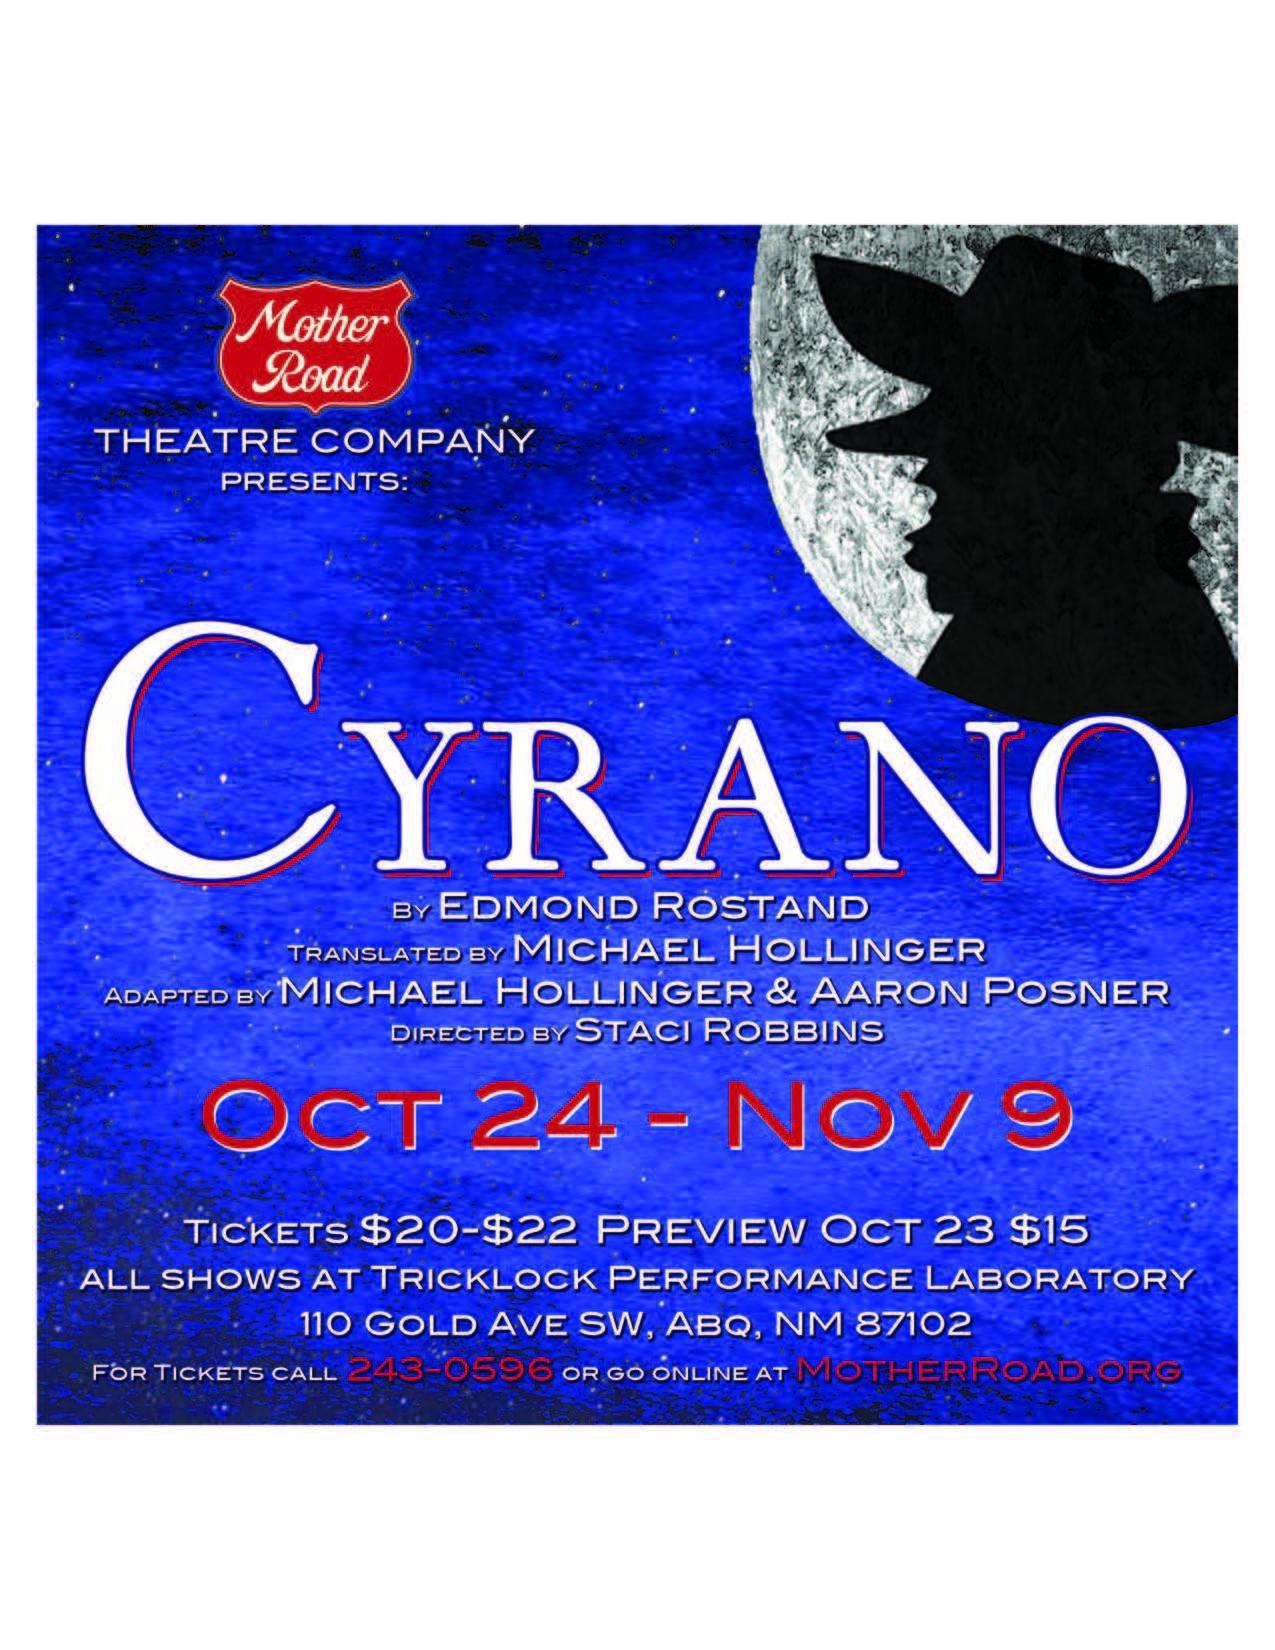 Cyrano poster 9•11.jpg